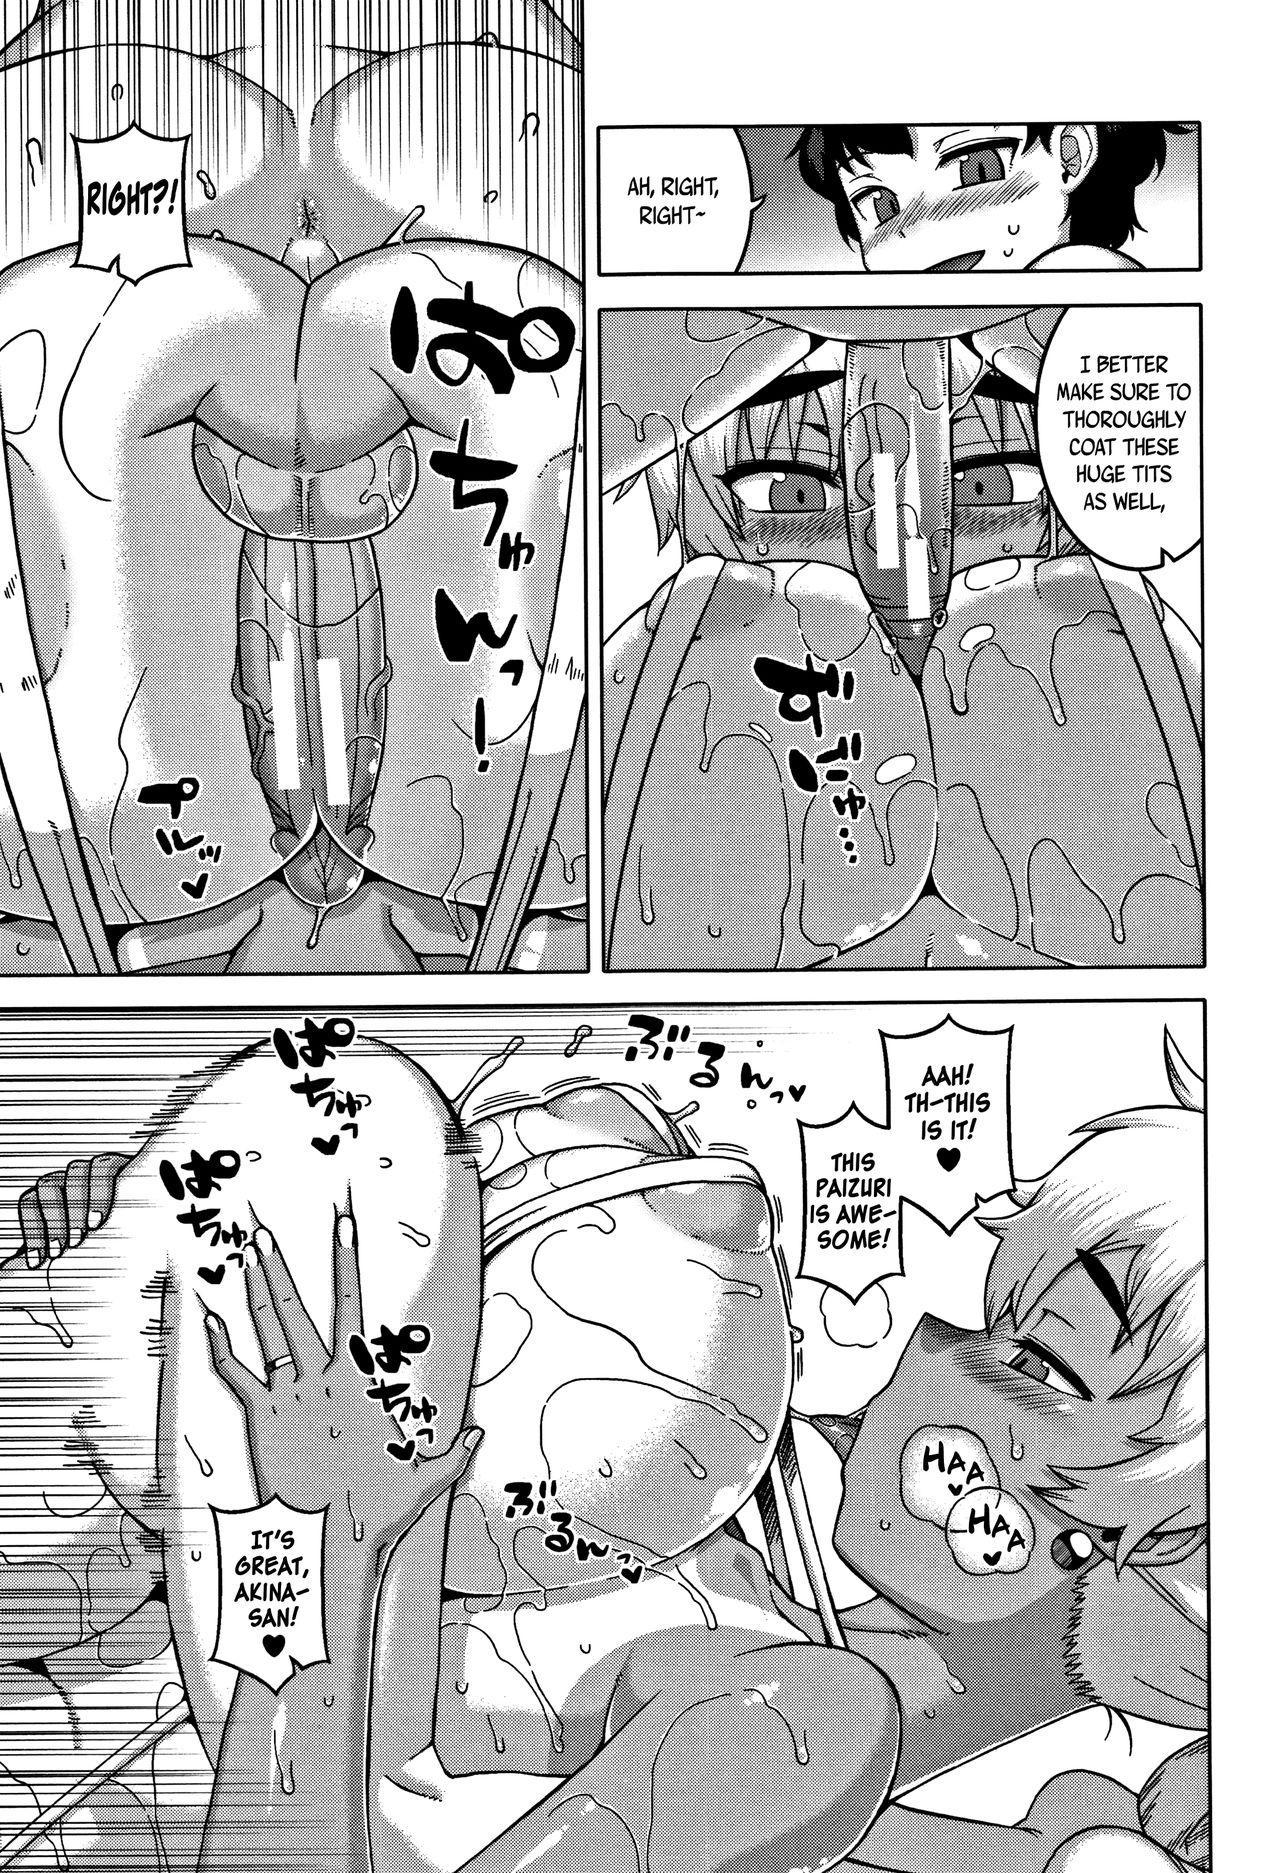 [Takatsu] Hitozuma A-san to Musuko no Yuujin N-kun - Married wife A and son's friend N-kun Ch. 1-3 [English] 53